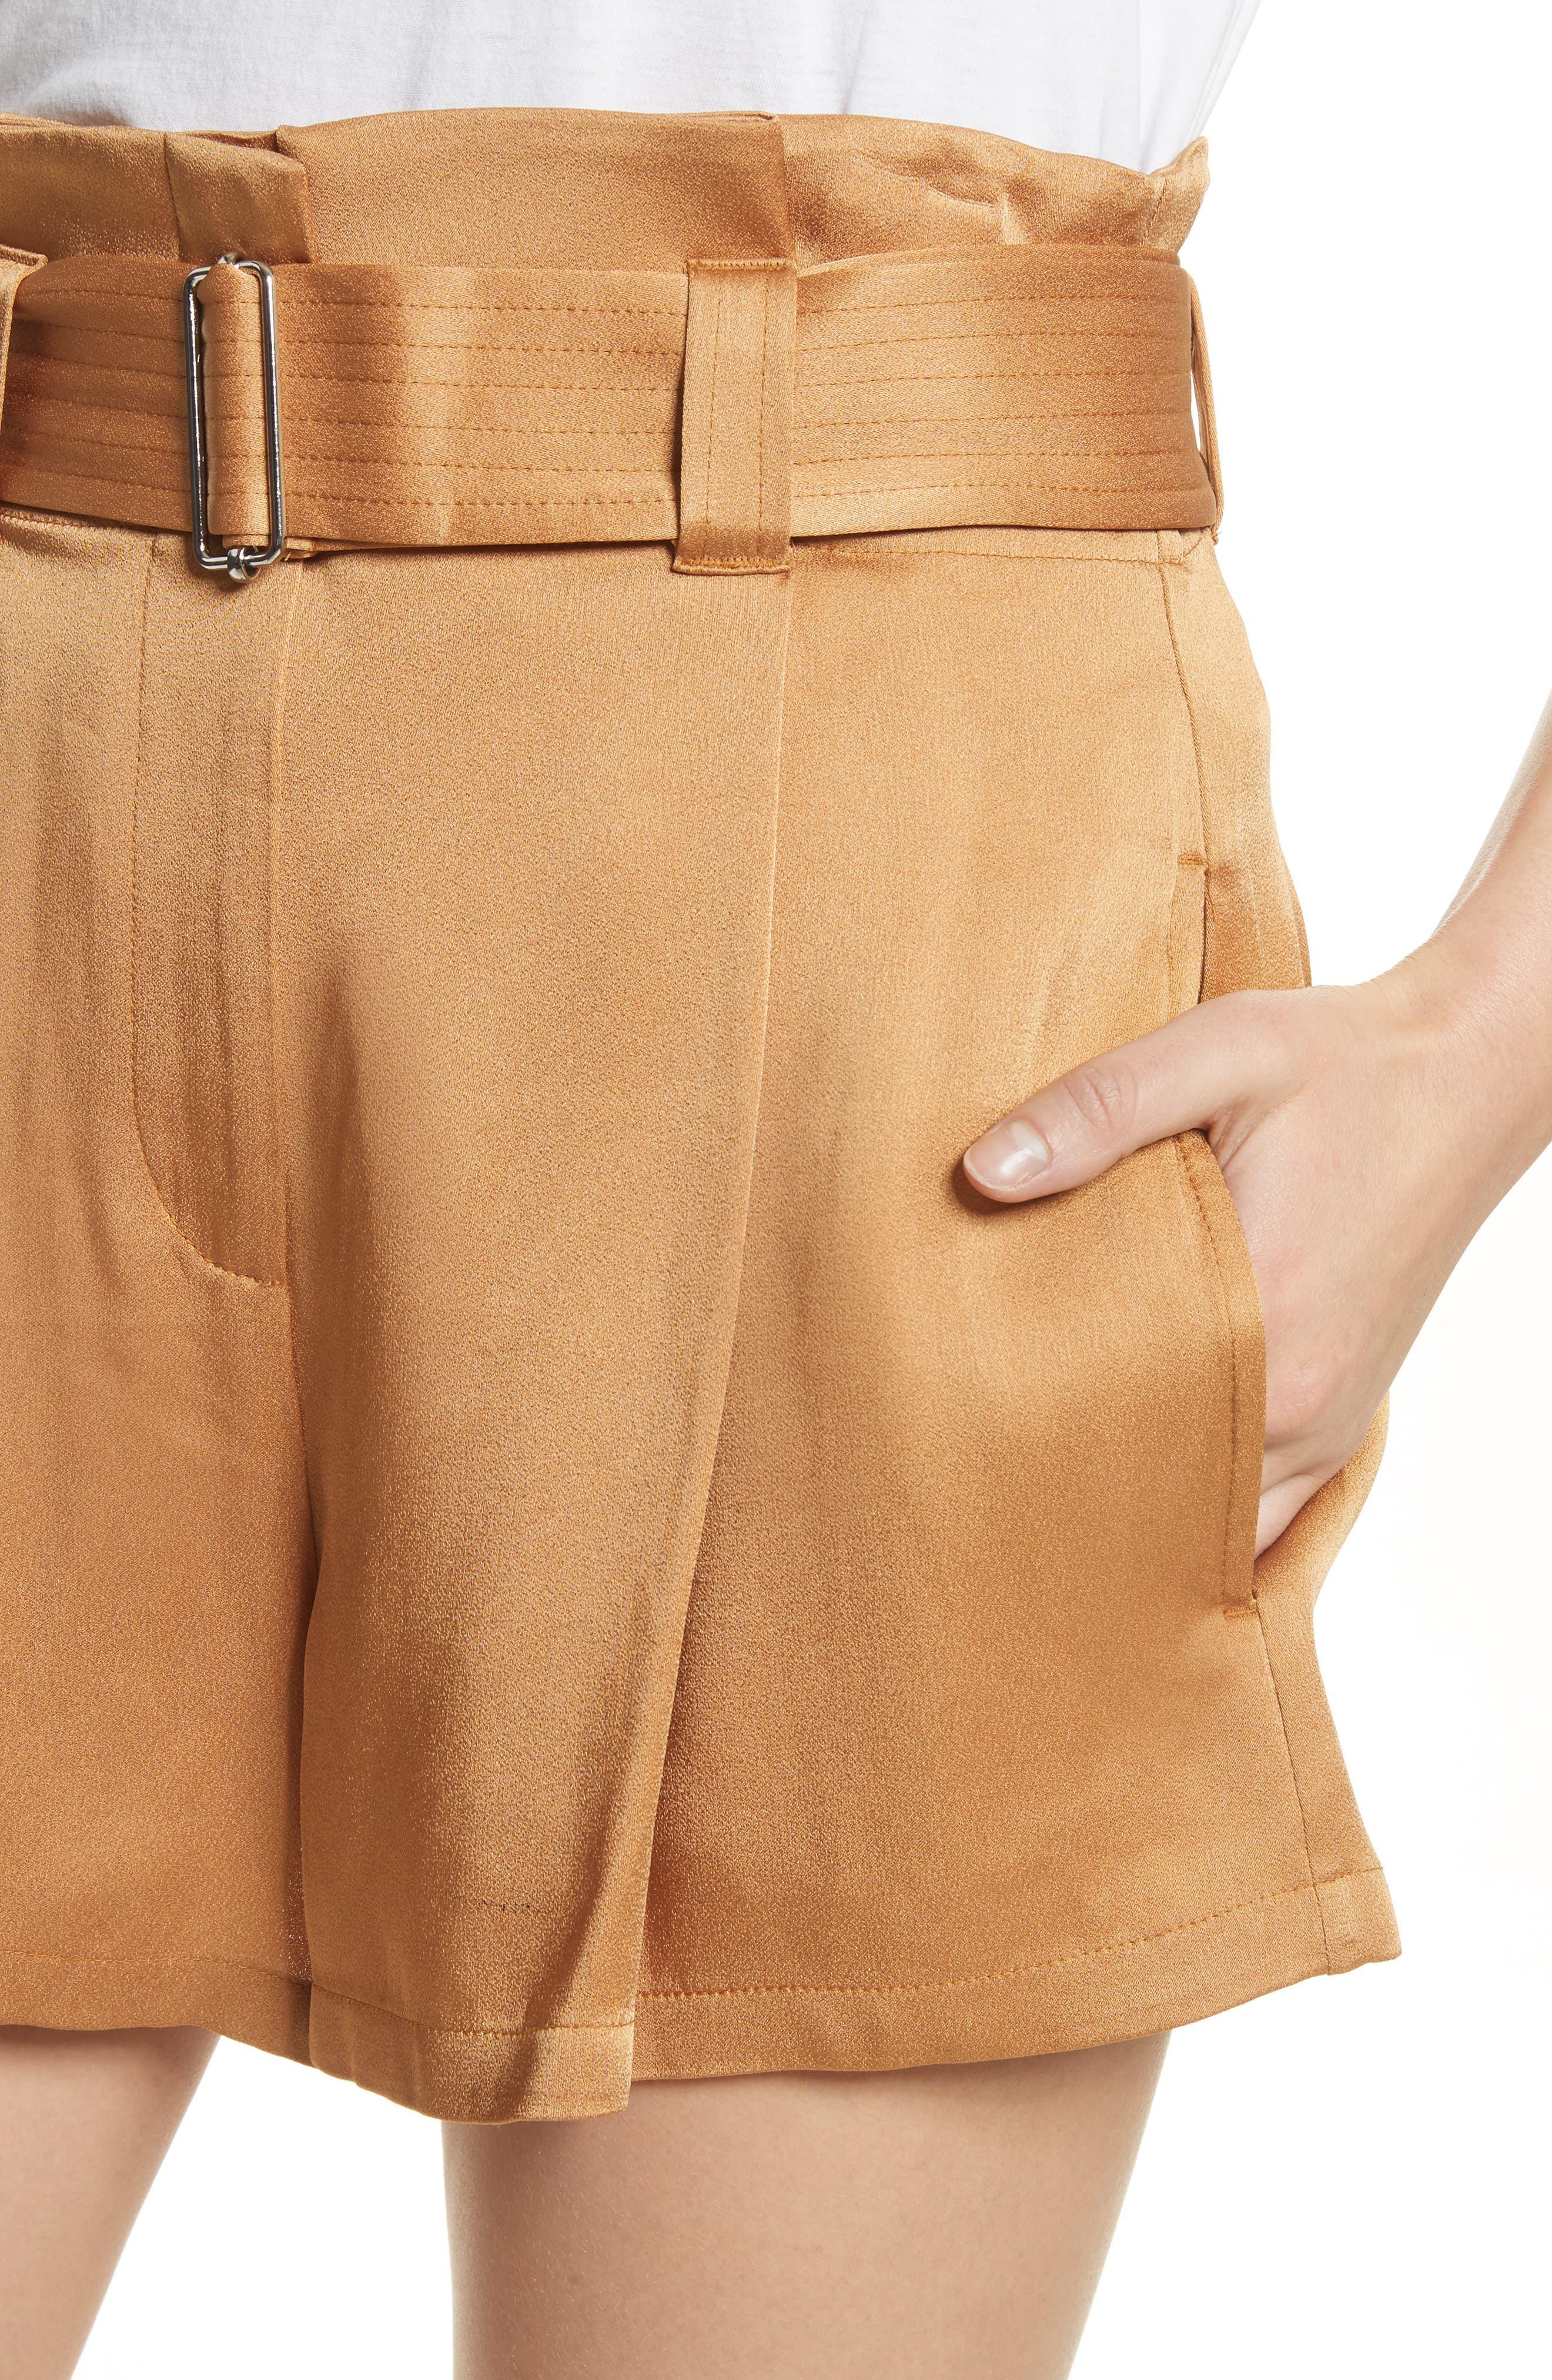 Deliah Paperbag Waist Shorts,                             Alternate thumbnail 4, color,                             Caramel